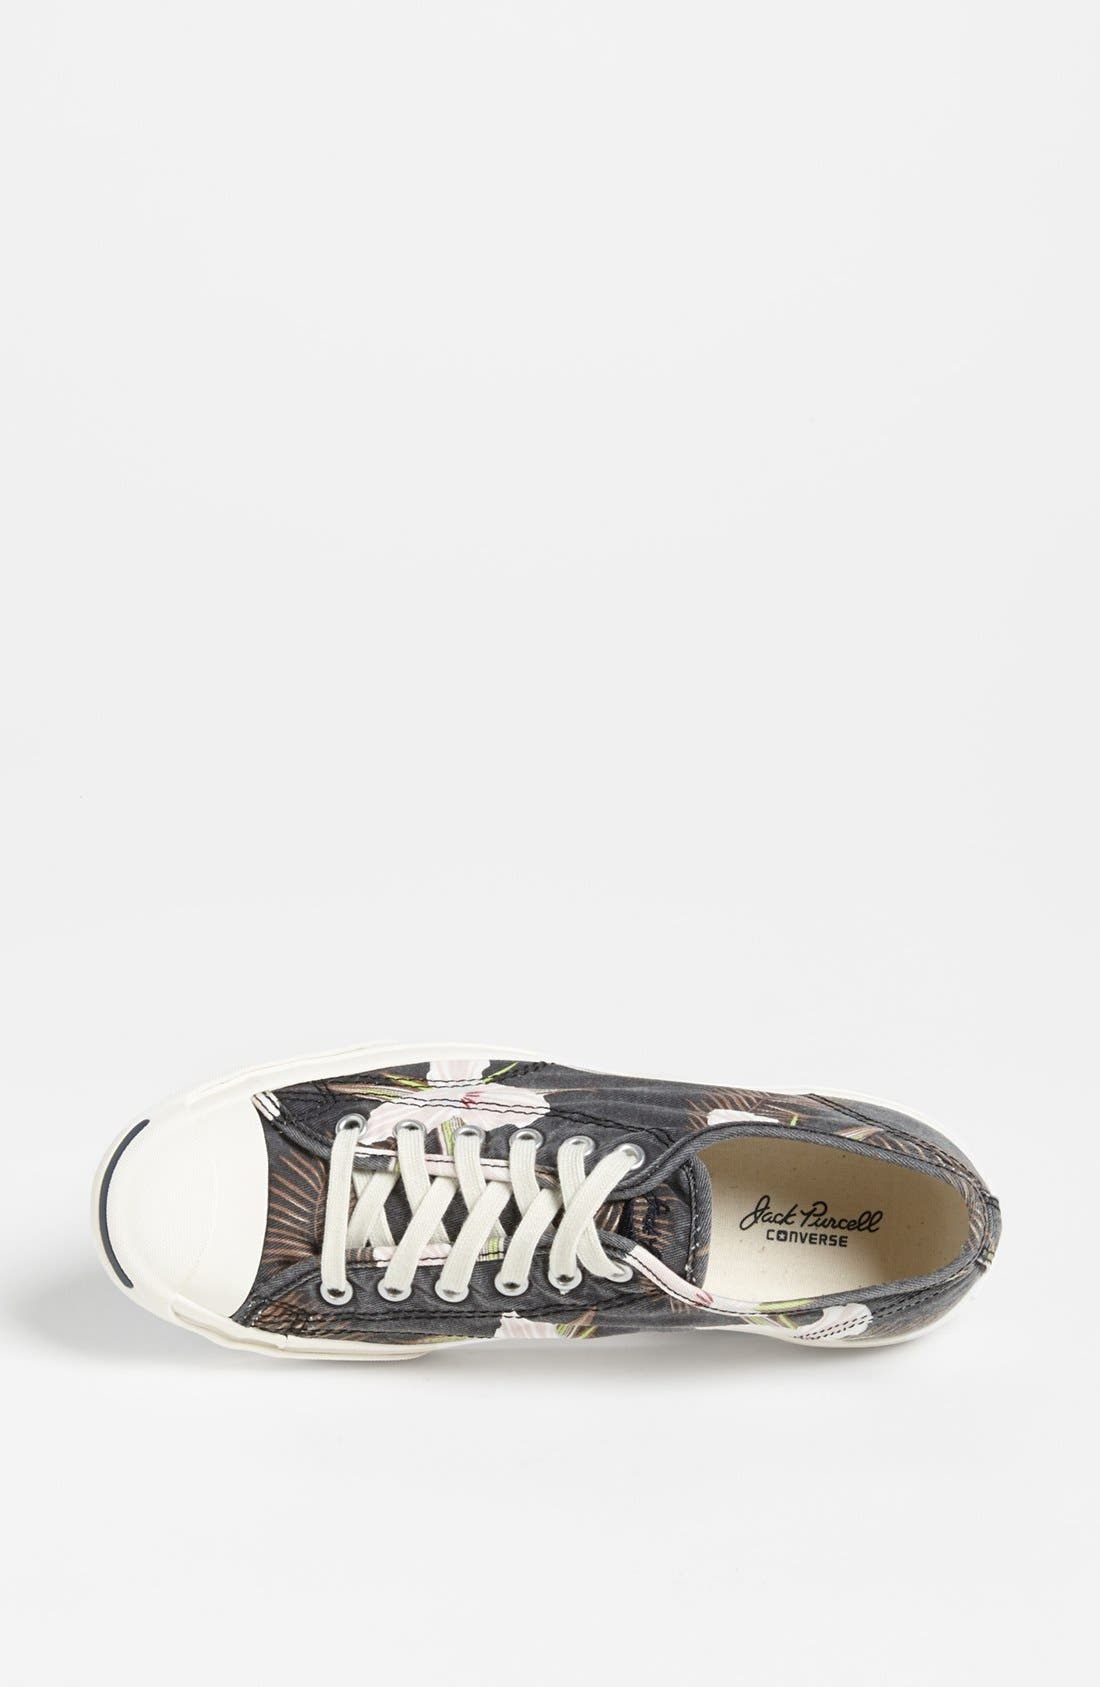 Alternate Image 3  - Converse 'Jack Purcell' Sneaker (Women)